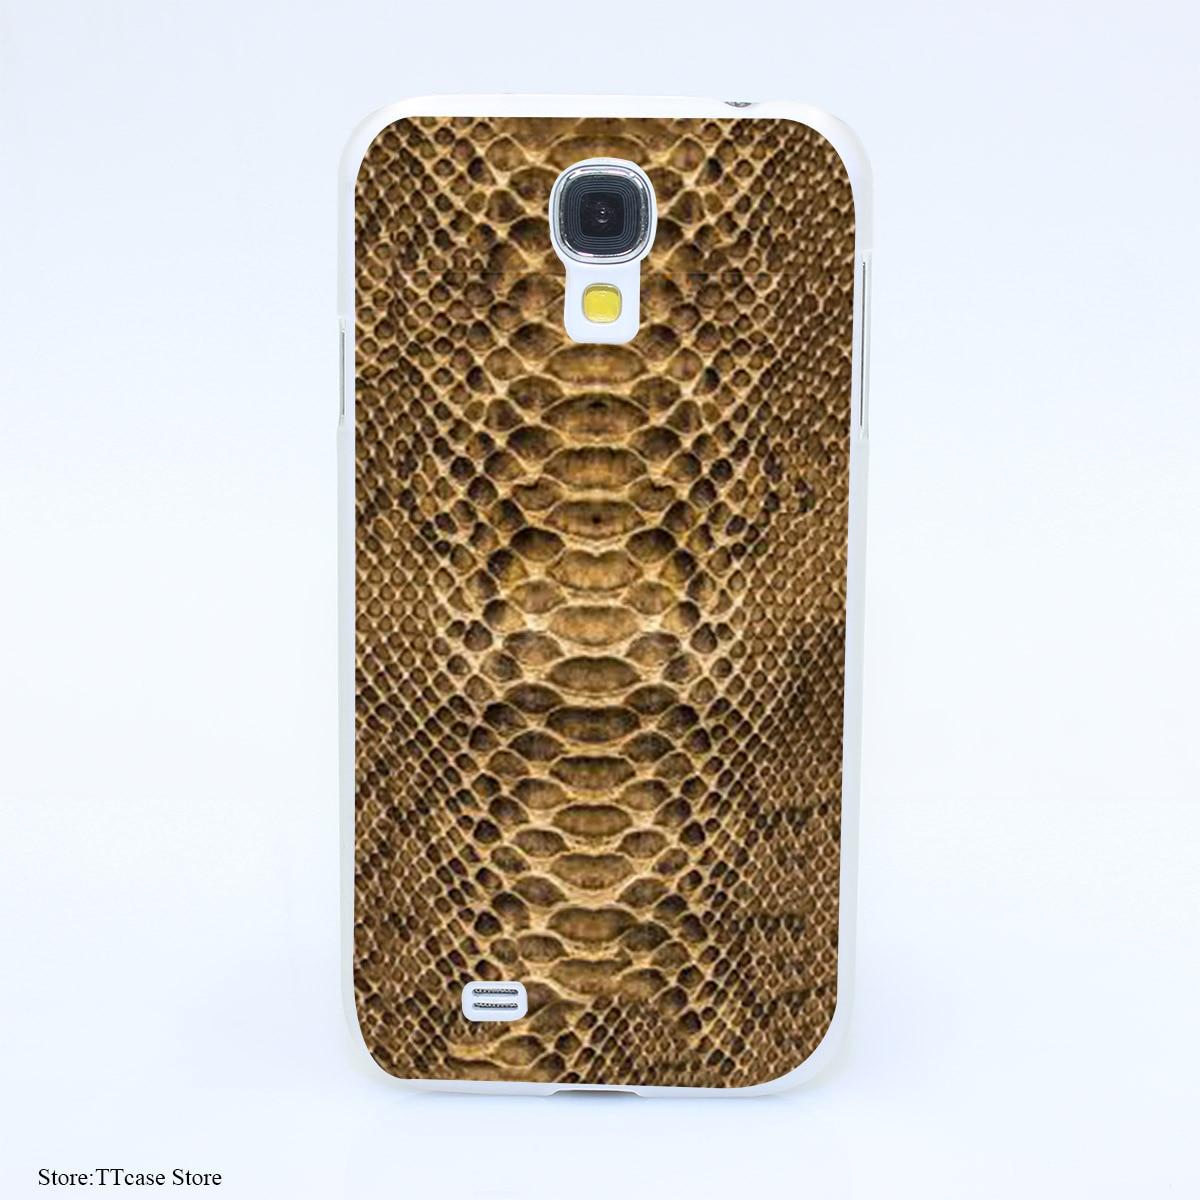 2168CA Luxury Just Cavallis  Snake Print Hard Transparent cheap Case Cover for Galaxy S2 S3 S4 S5 & Mini S6 S7 & edge Plus